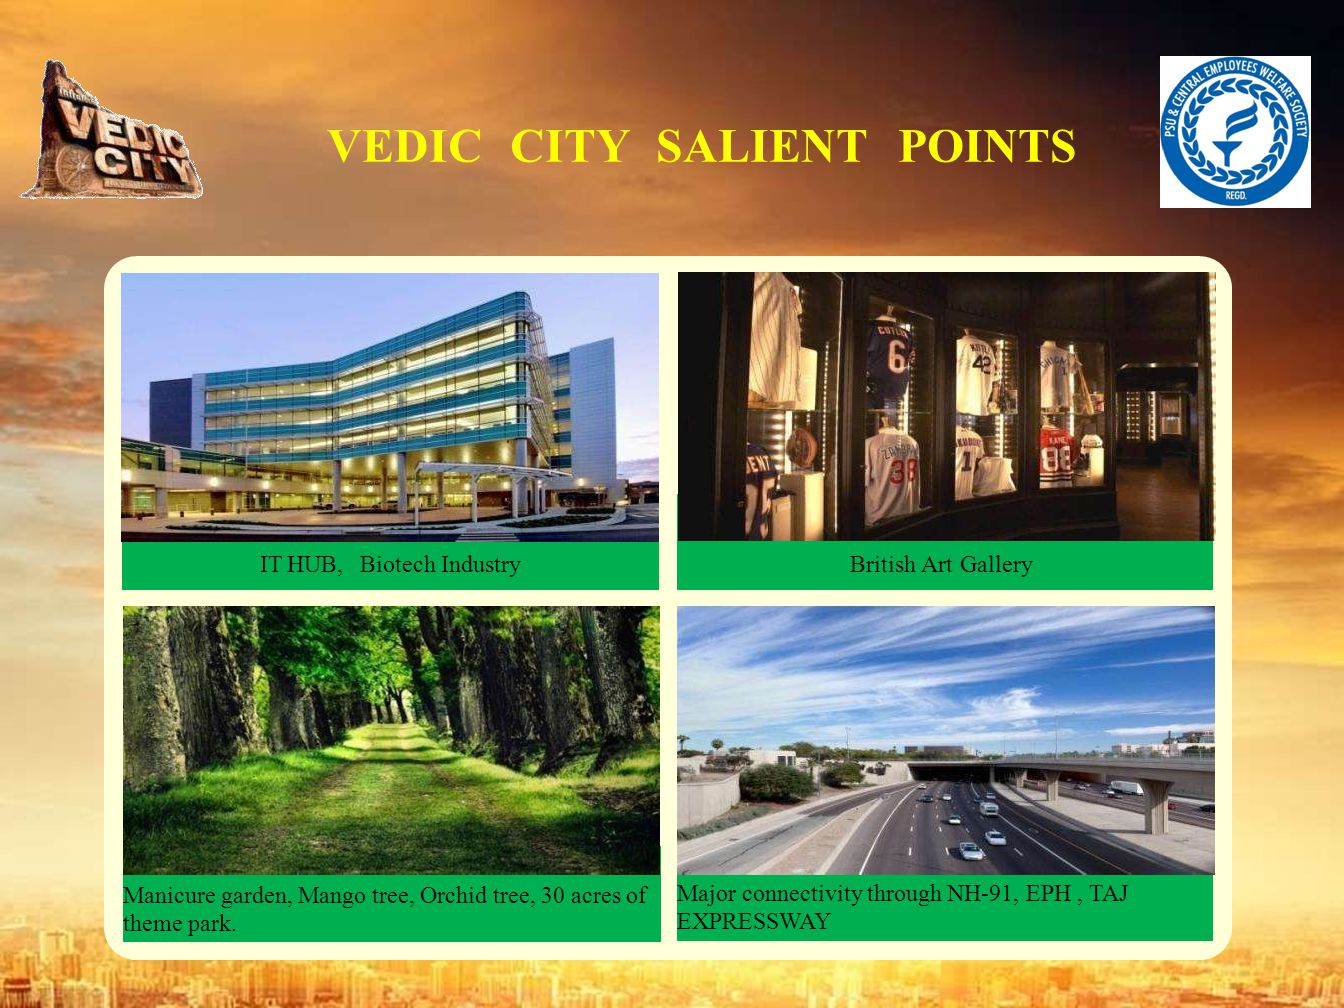 VEDIC CITY SALIENT POINTS